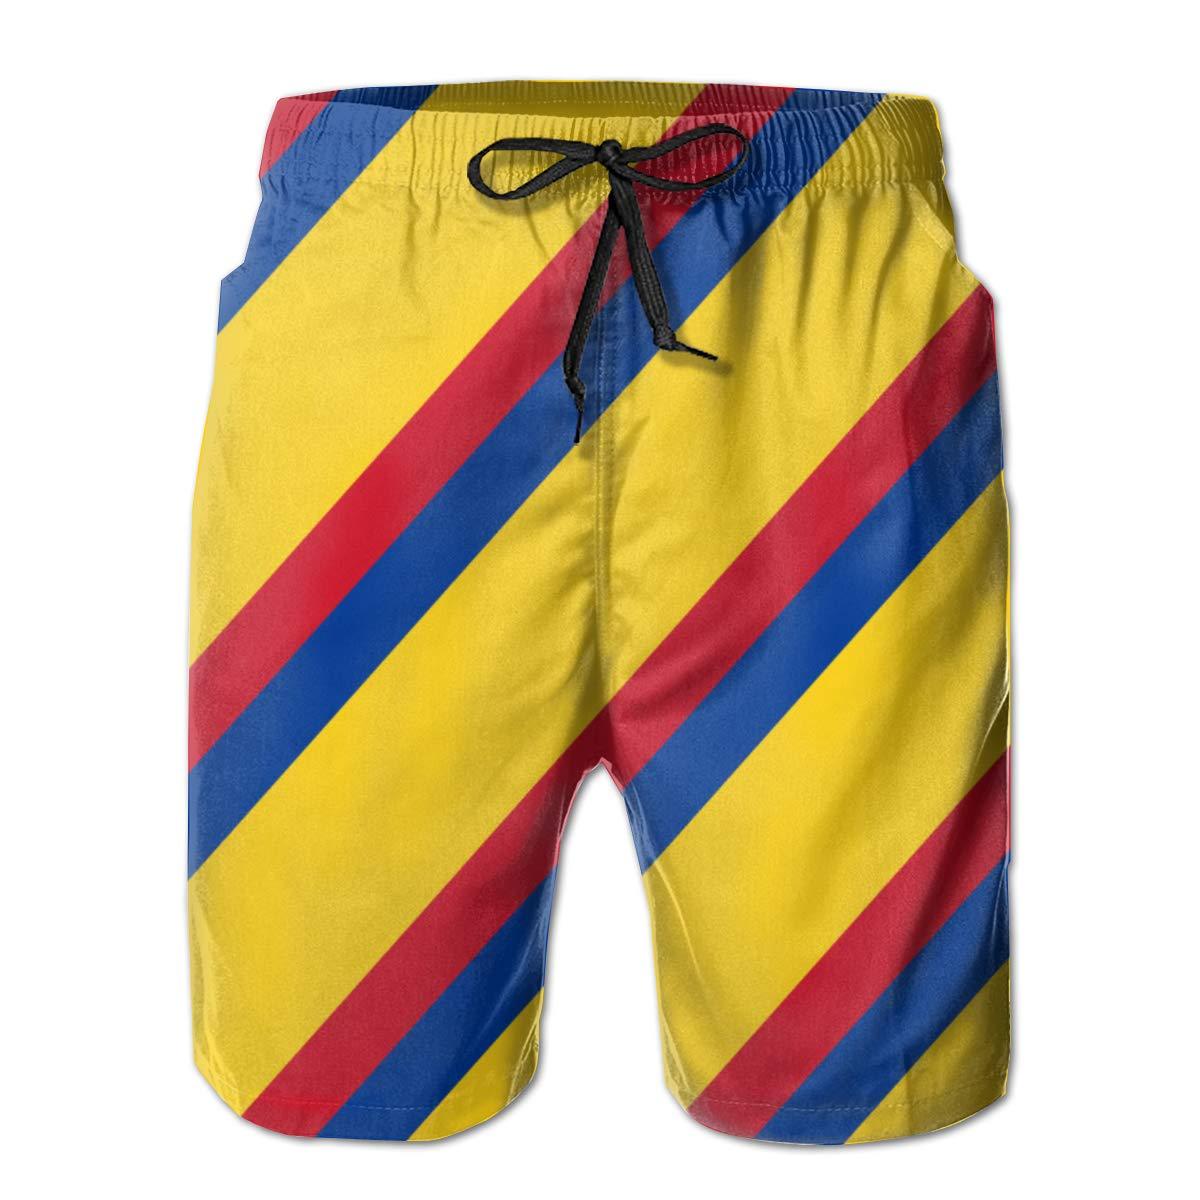 YongColer Summer Gift Men Swim Trunks Quick Dry Beach Surfing Running Board Shorts